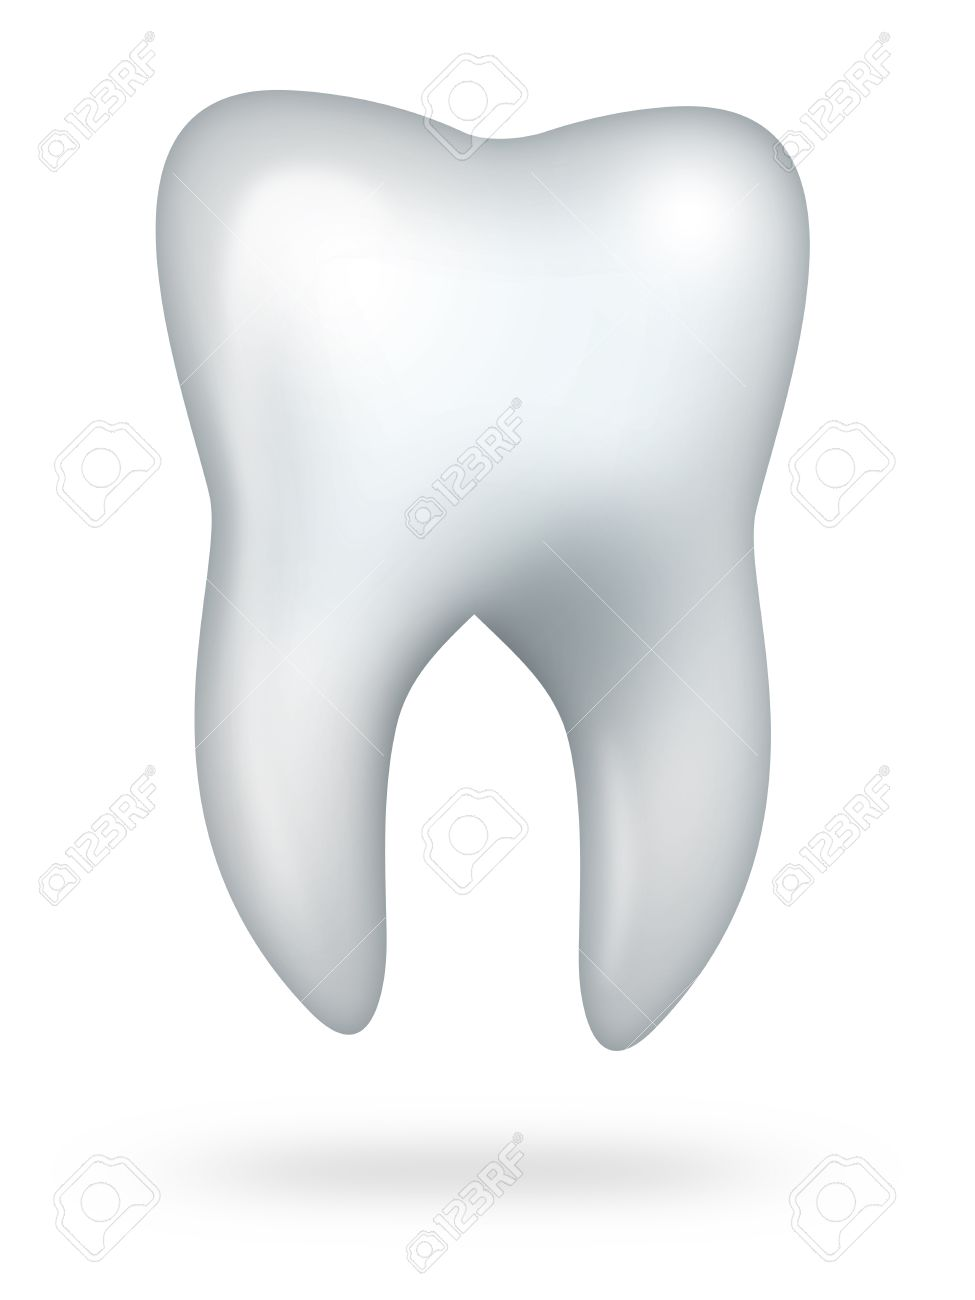 molar teeth